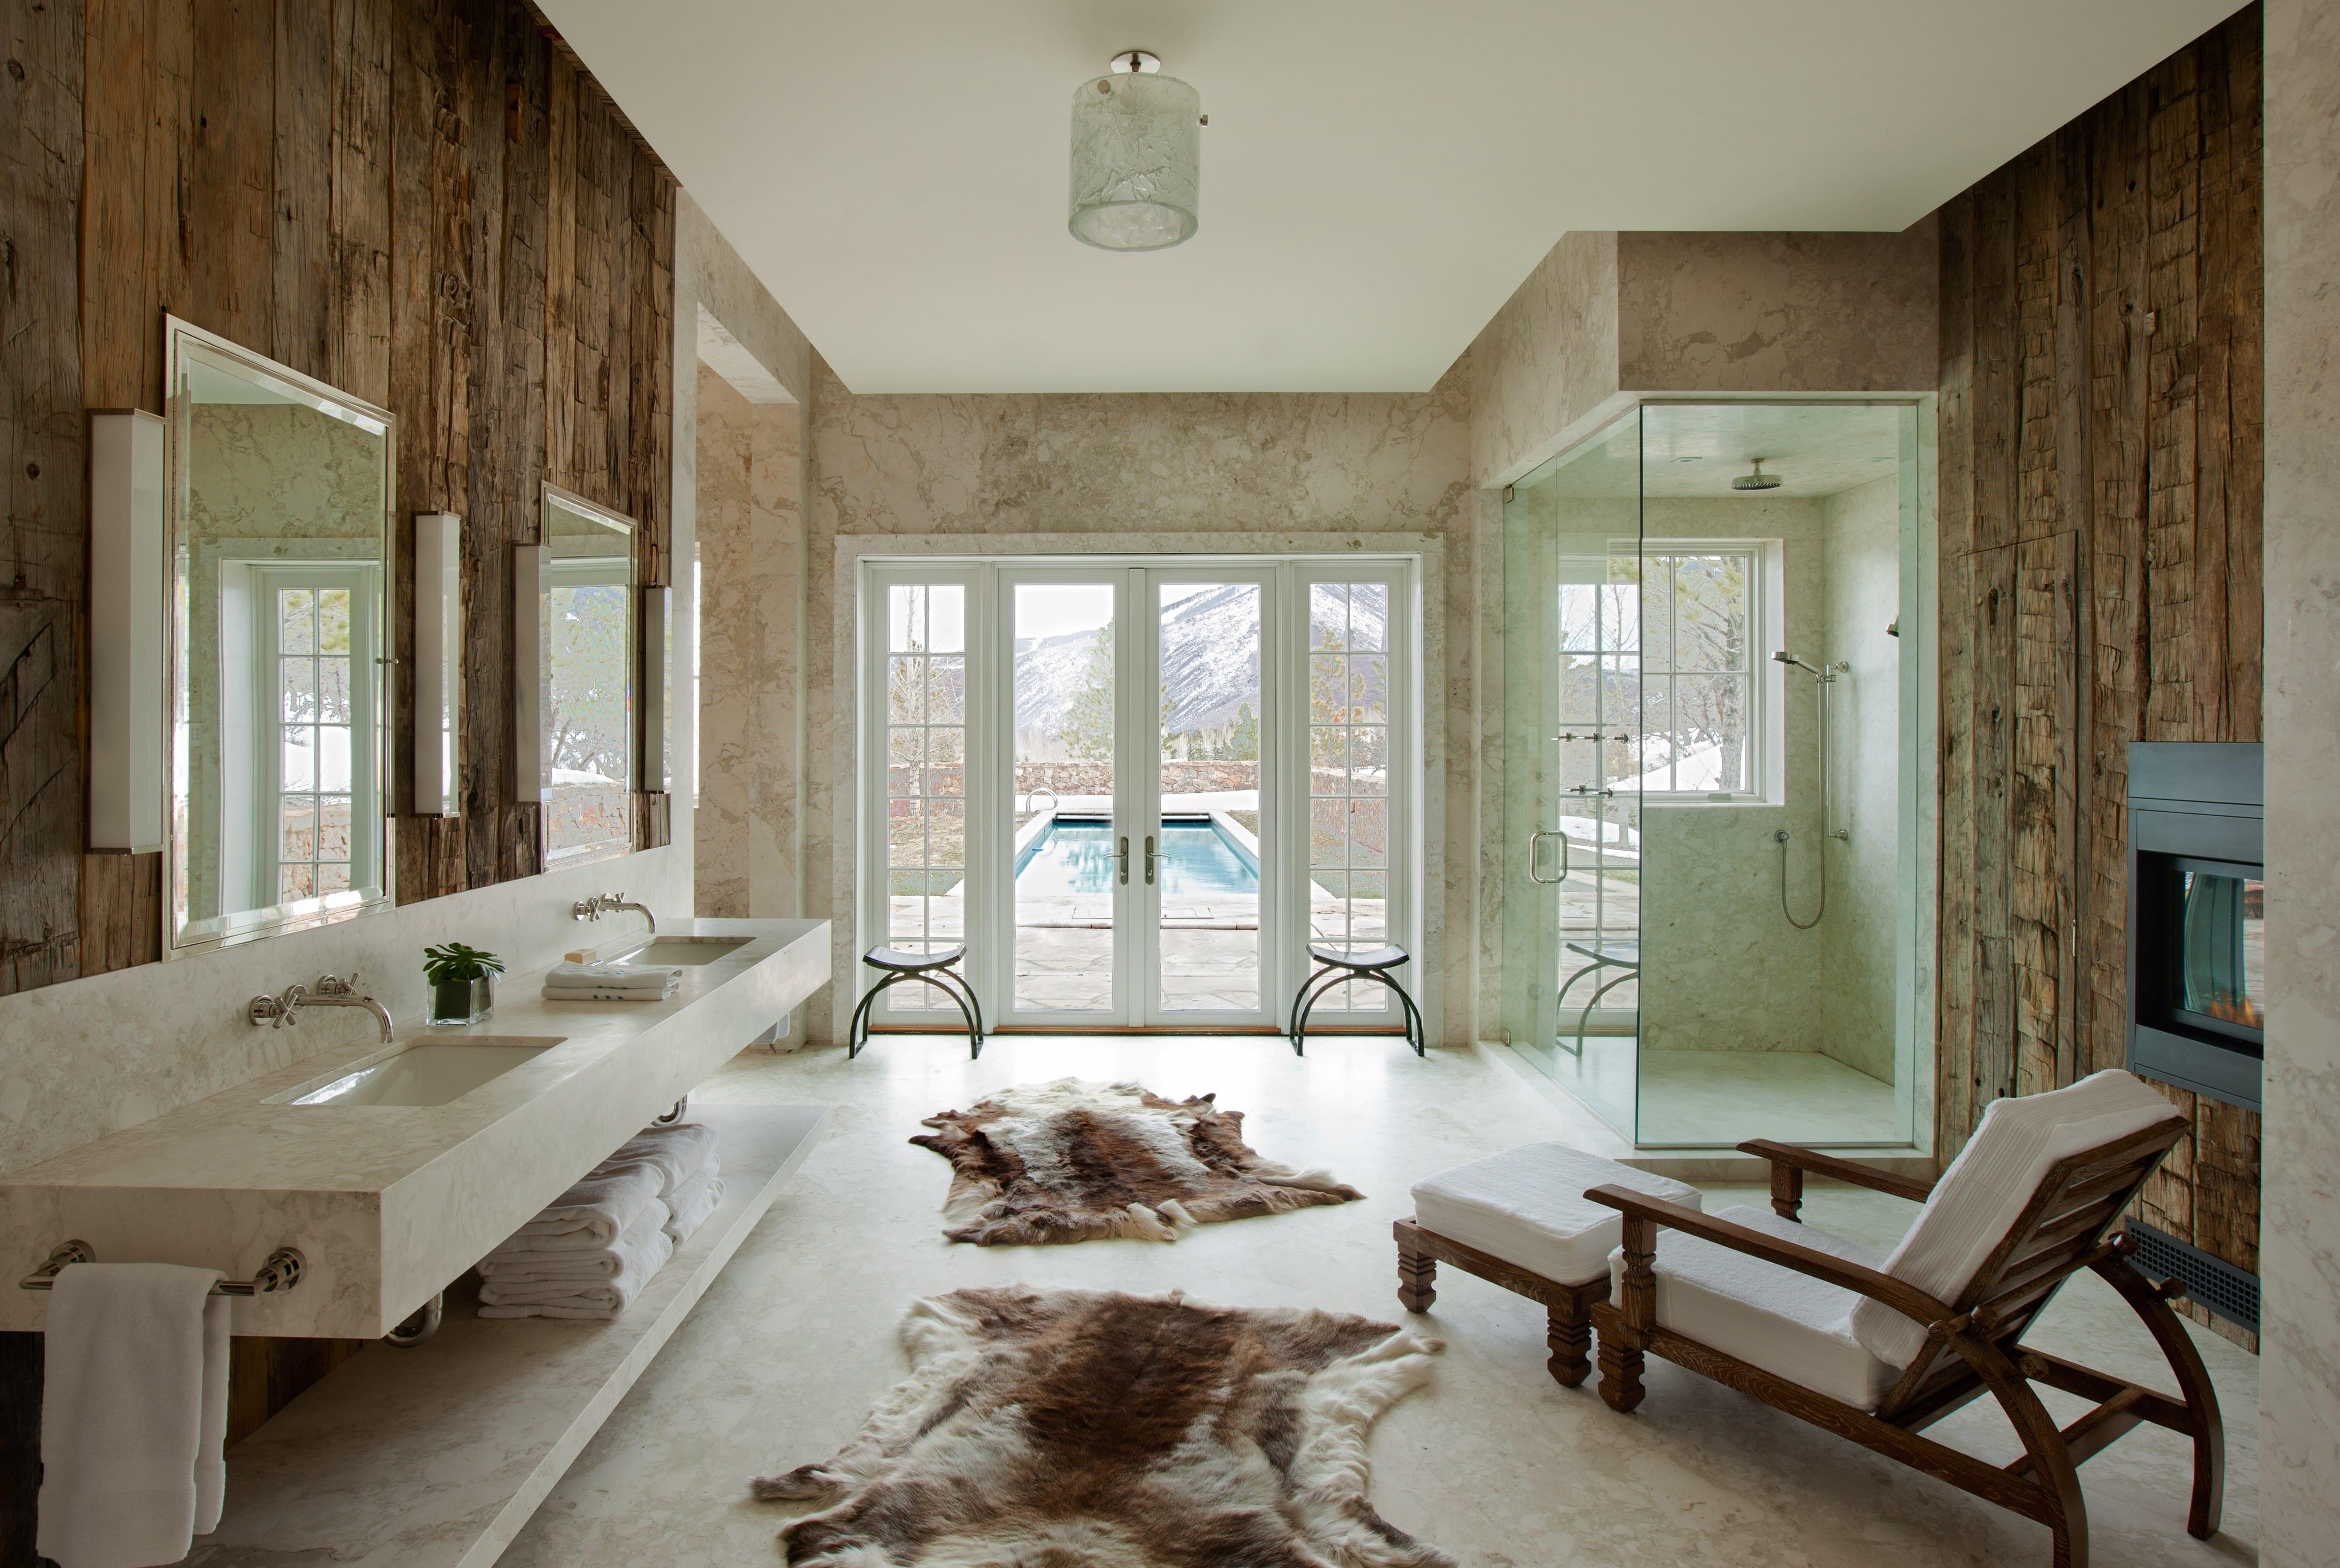 Badezimmer Vintage Style   Retro Badezimmer So Bringst Du Nostalgie ...